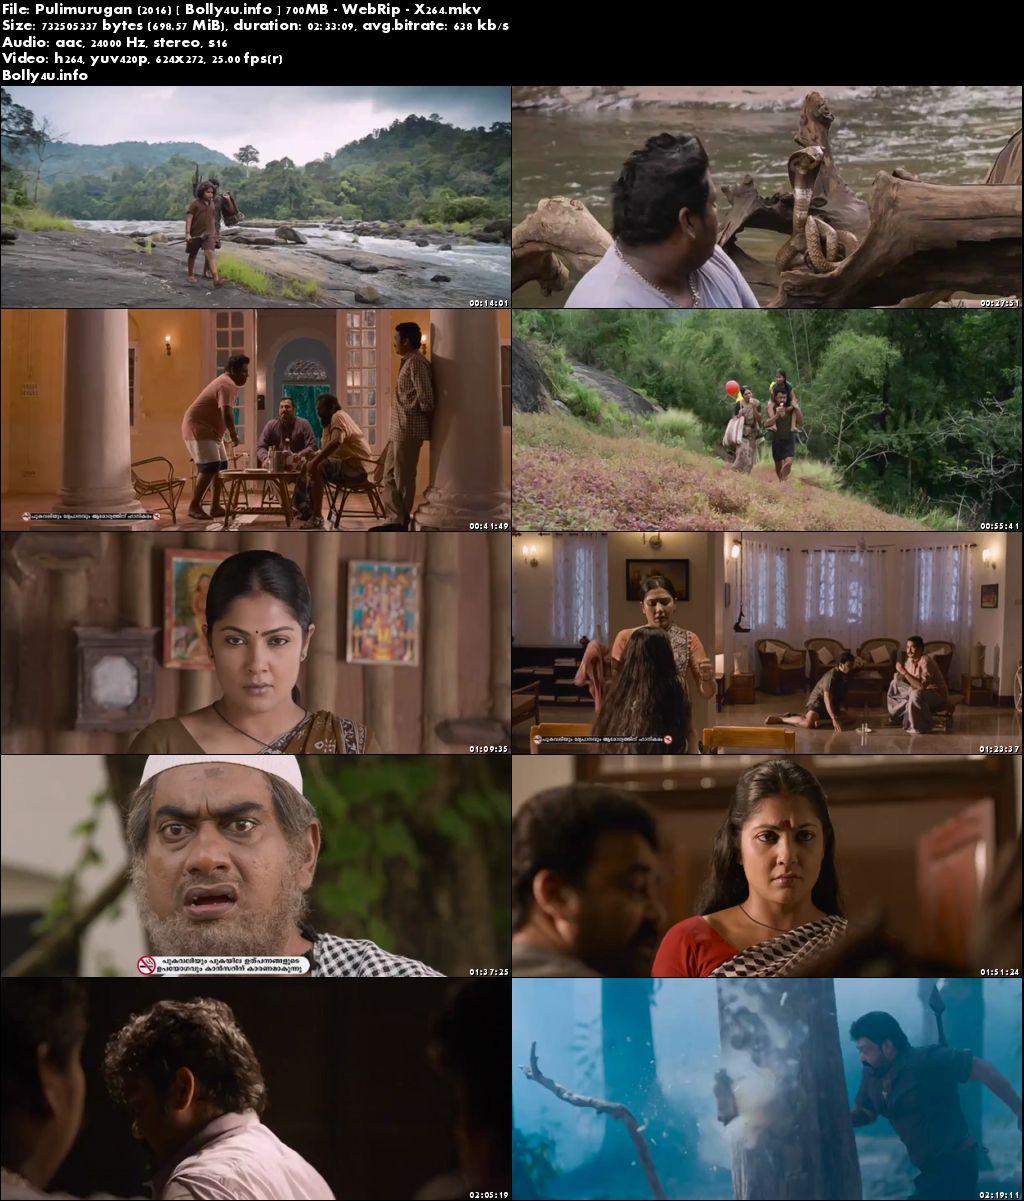 Screen Shoots of Watch Online Pulimurugan 2016 WEBRip 450MB Malayalam Movie 480p Free Download bolly4u.info